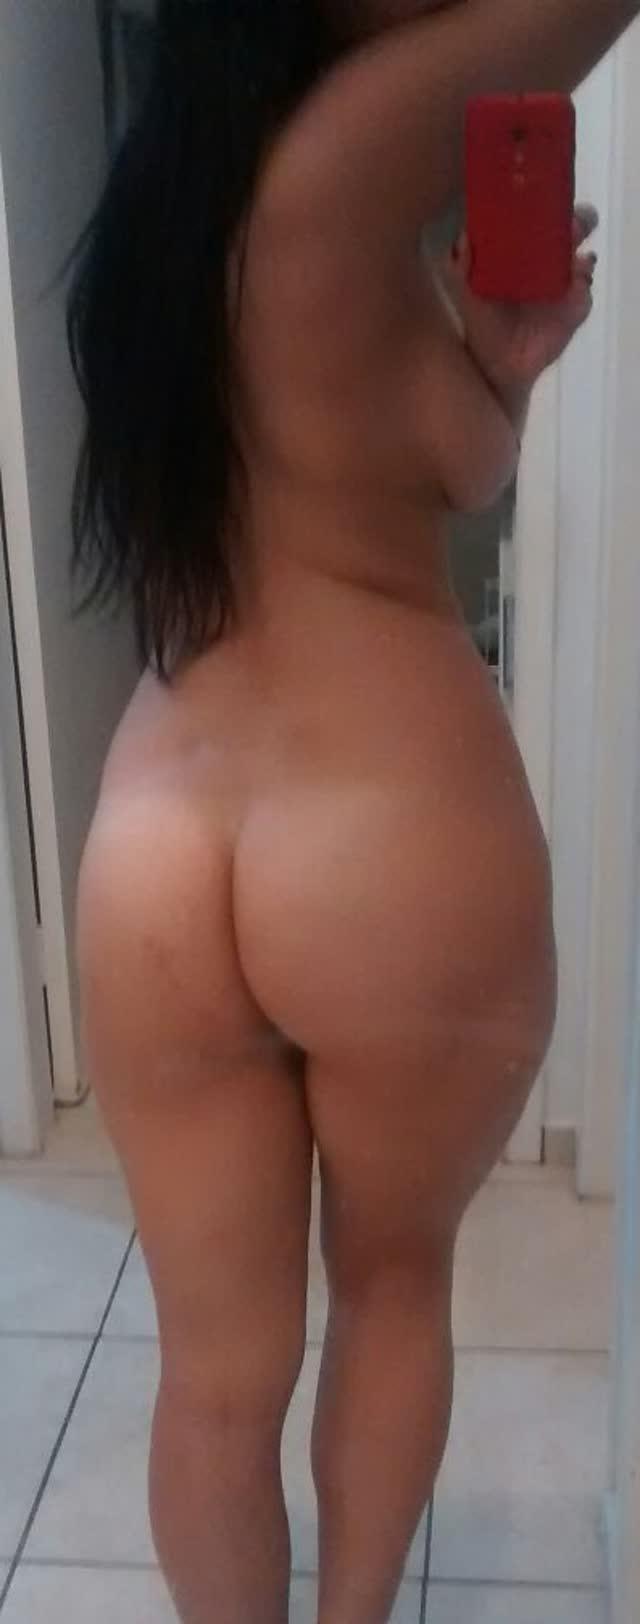 Fazendo surpresa para marido, nudes do zapzap